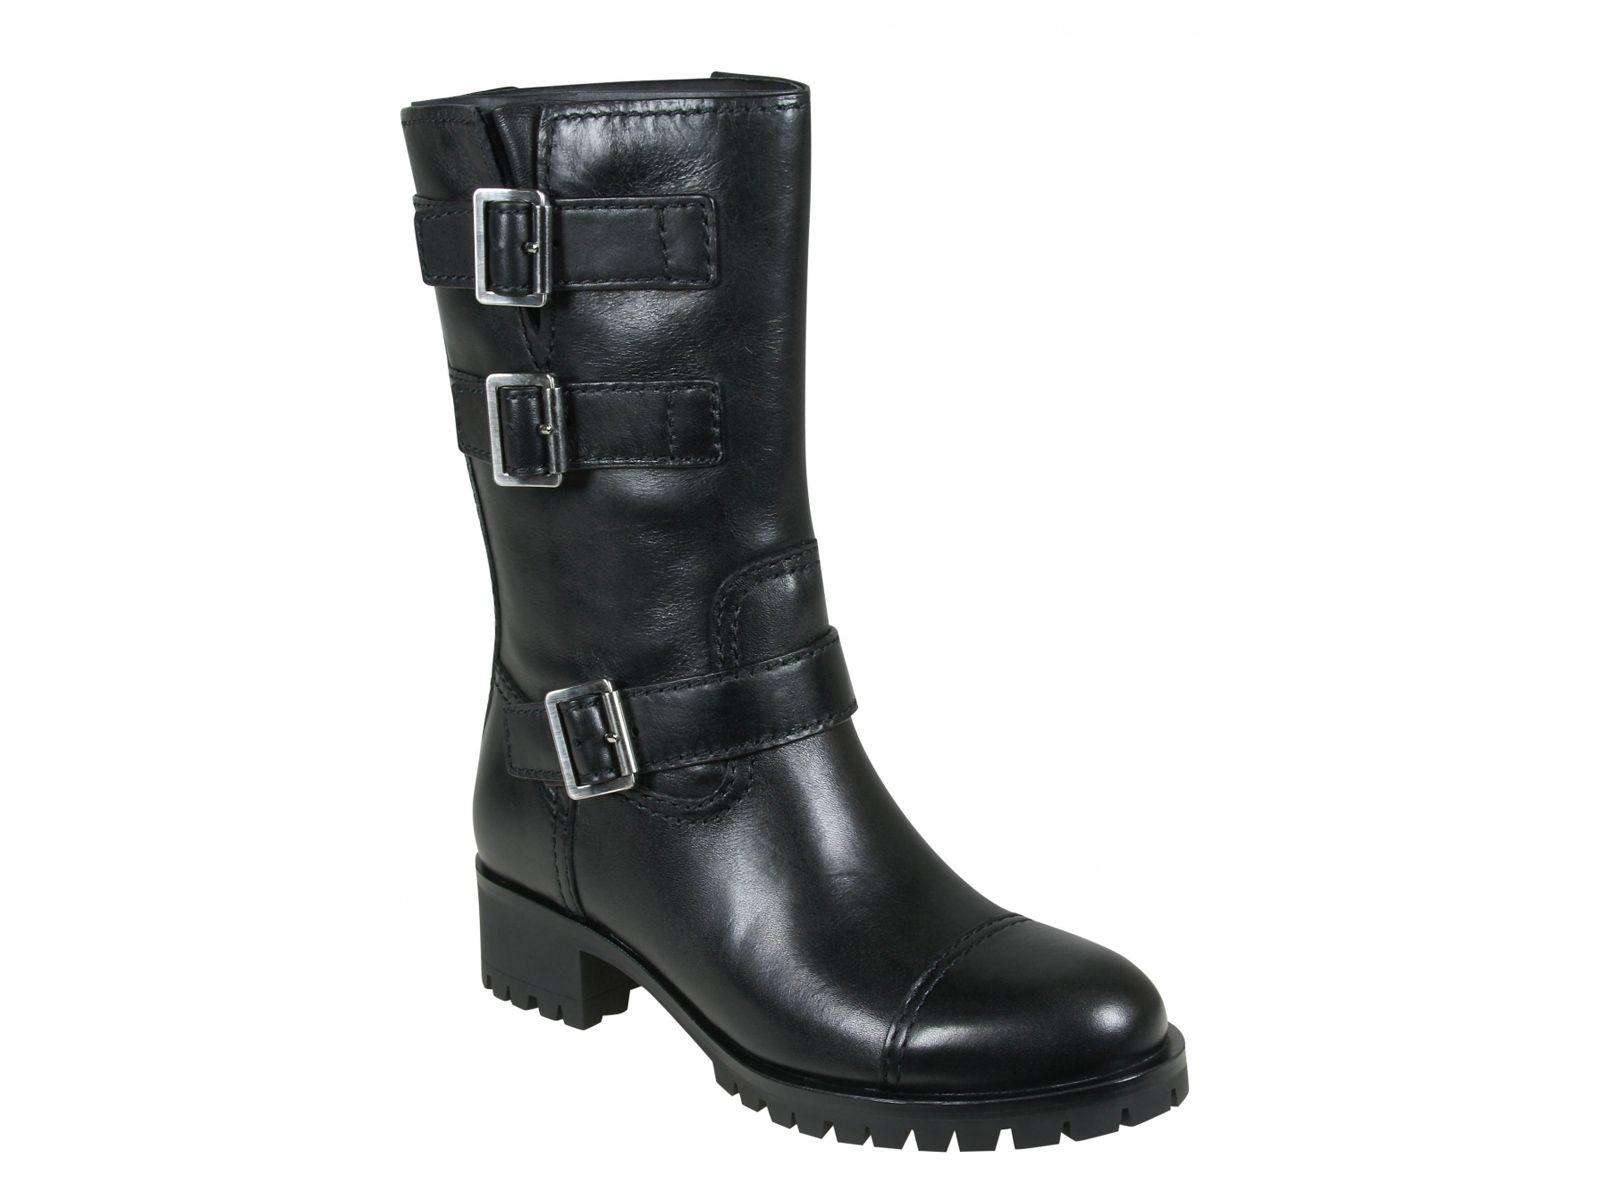 Prada women's biker boots in black Calf leather - Italian Boutique €487